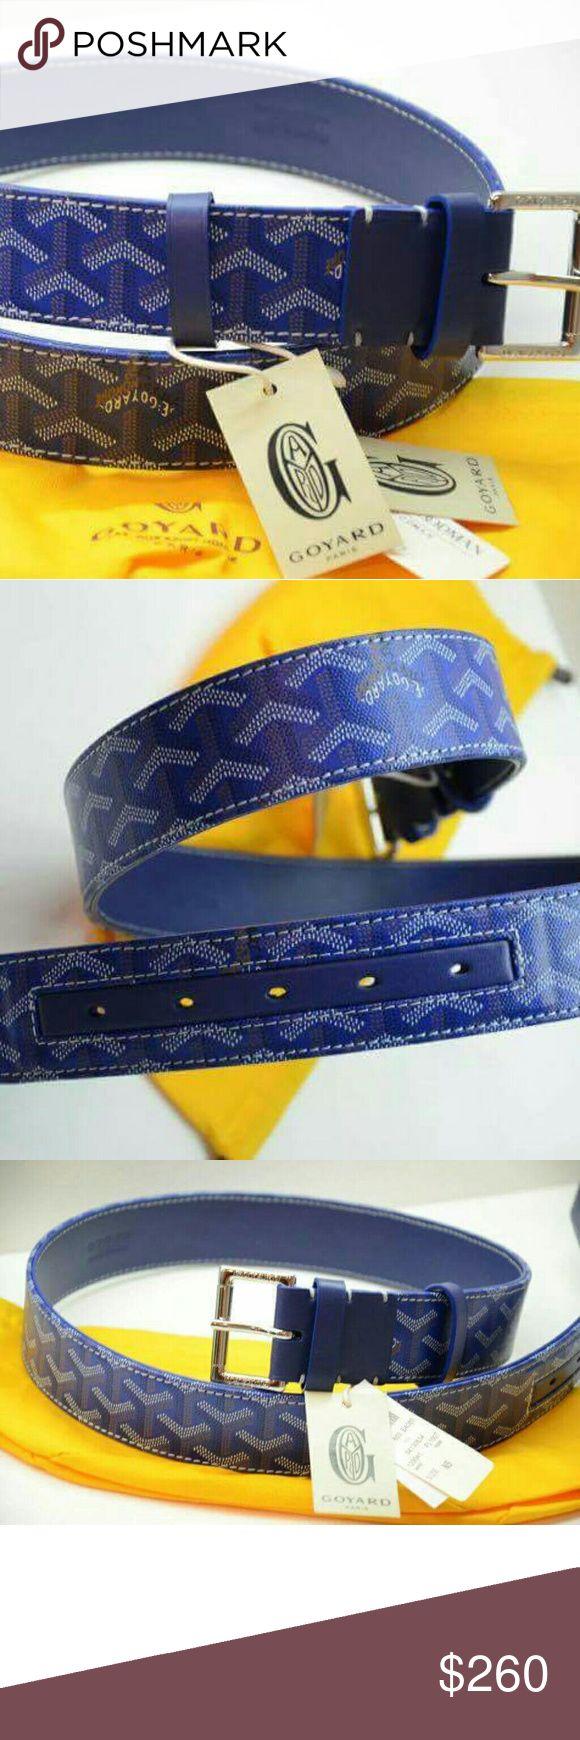 Goyard Belt Blue 30-36 Brand New Text 404_602_2558 for offers Goyard Accessories Belts